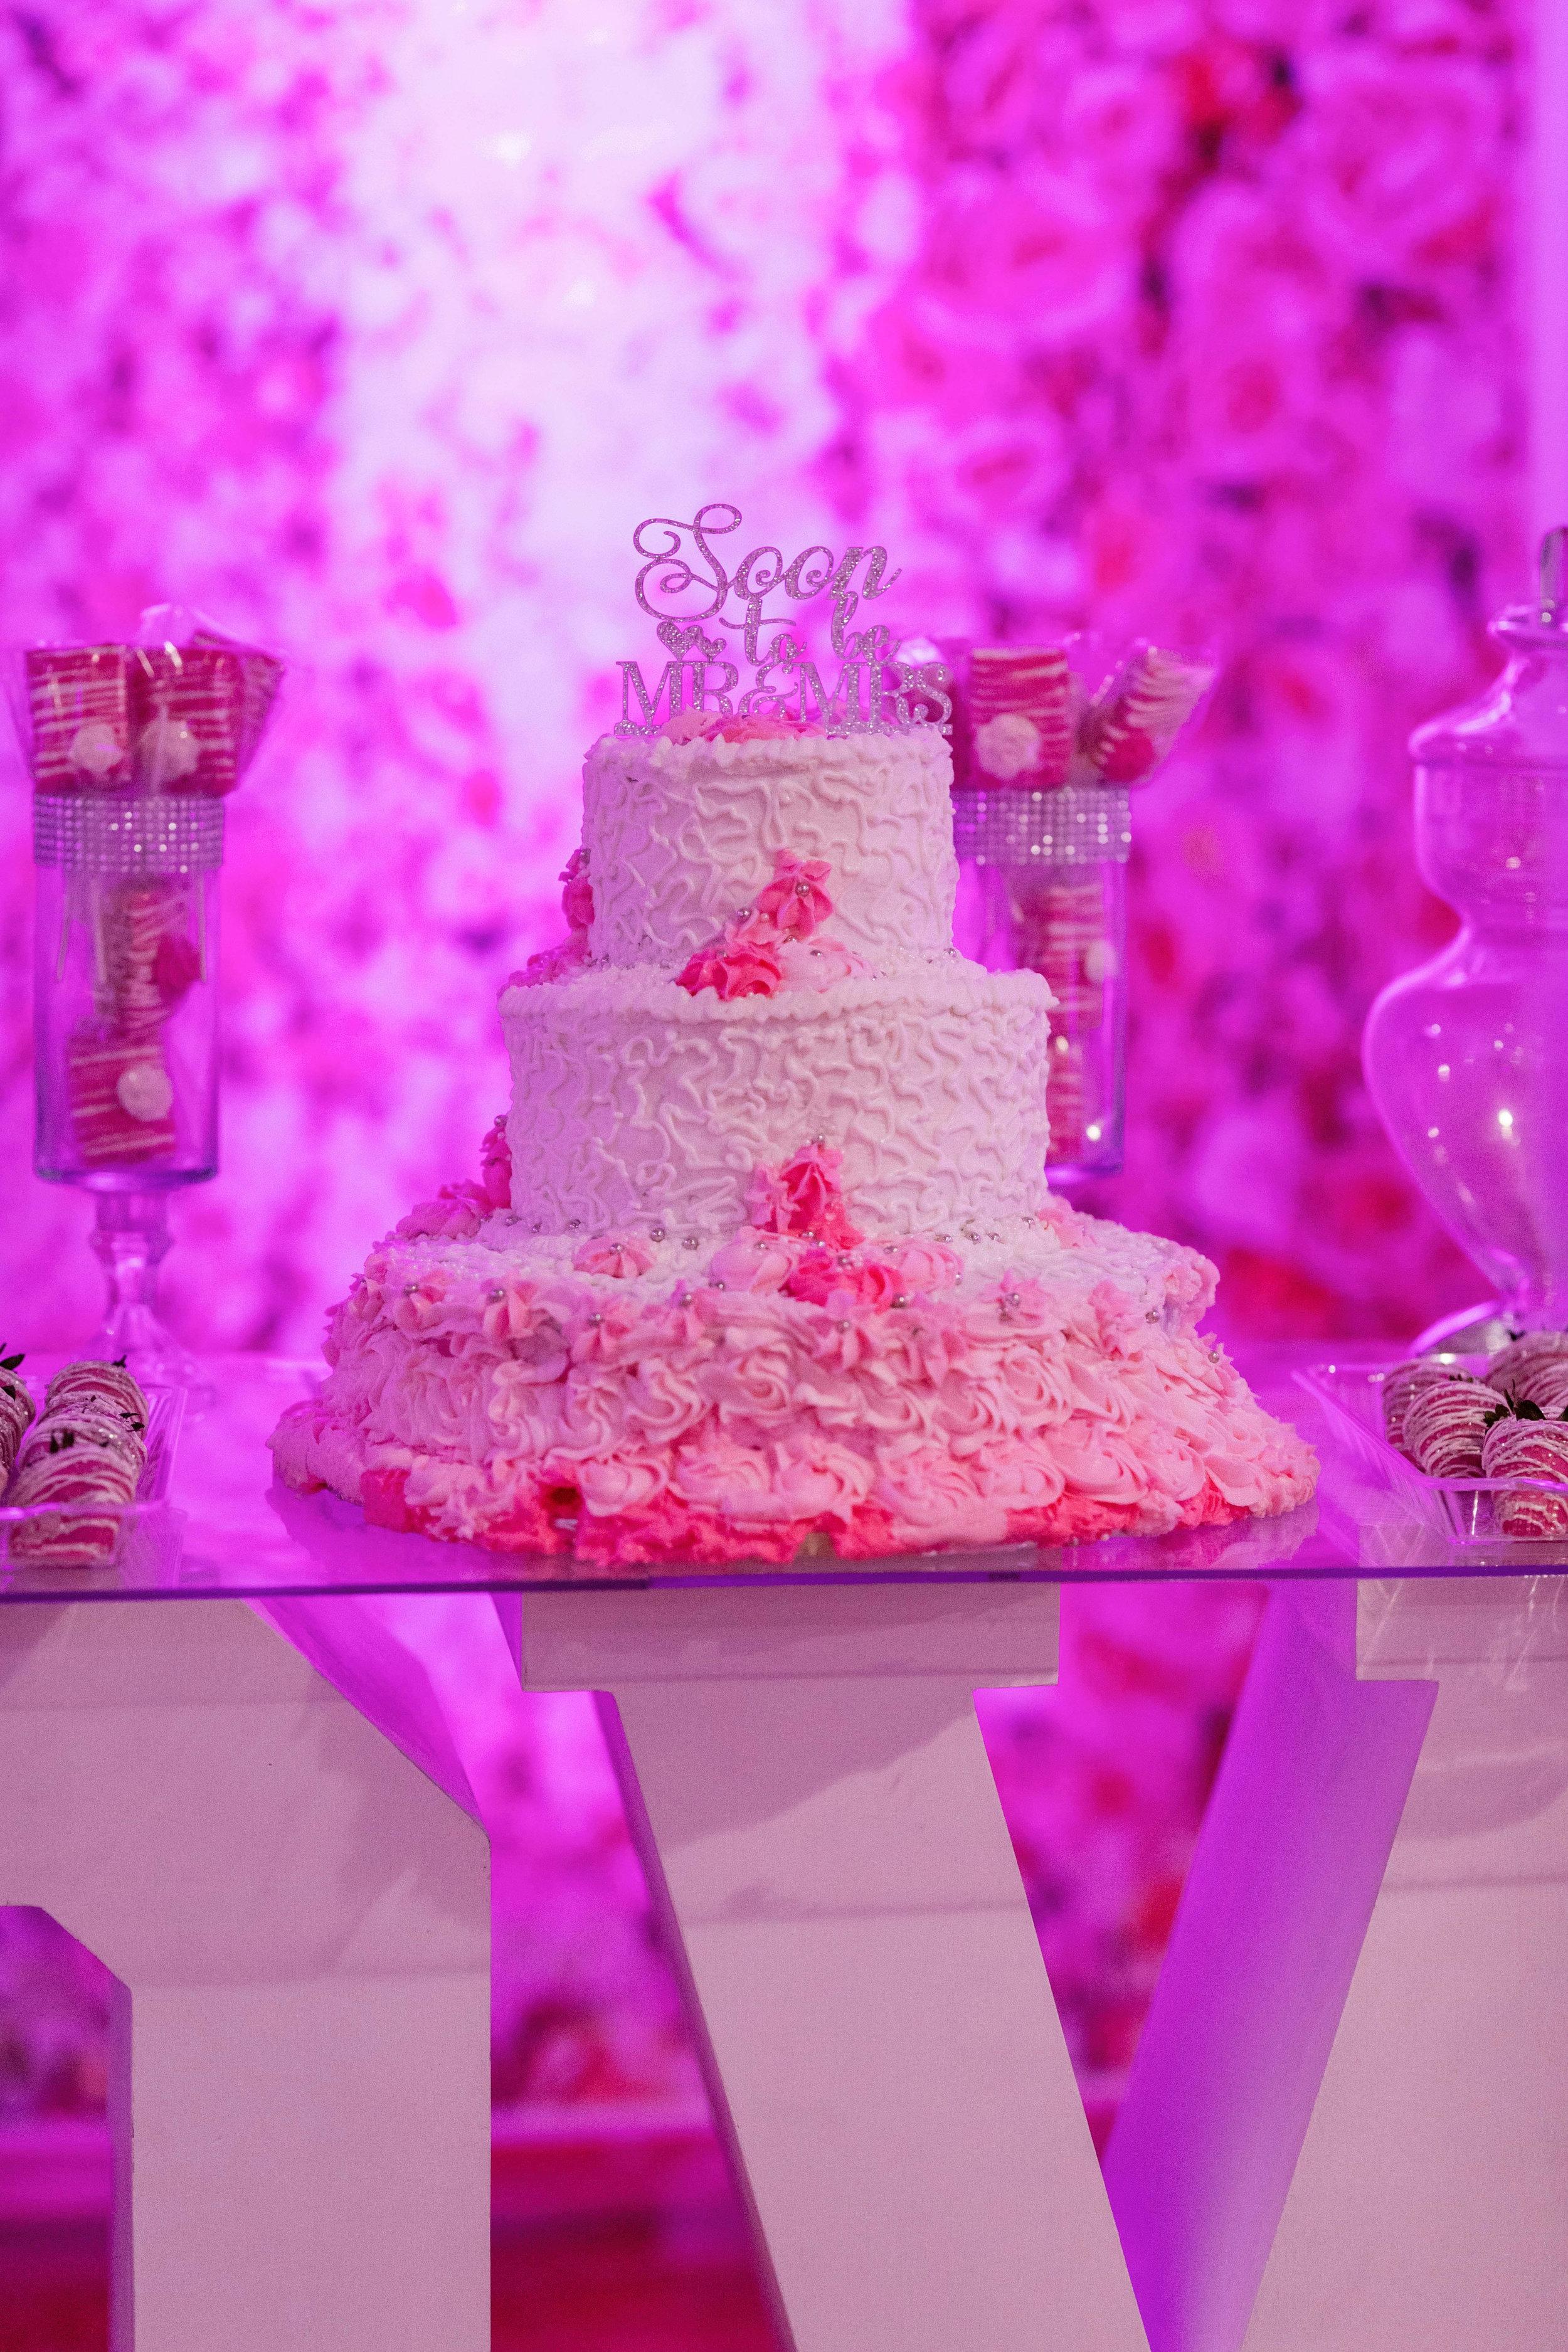 Opont-Wedding-Shower-6.jpg